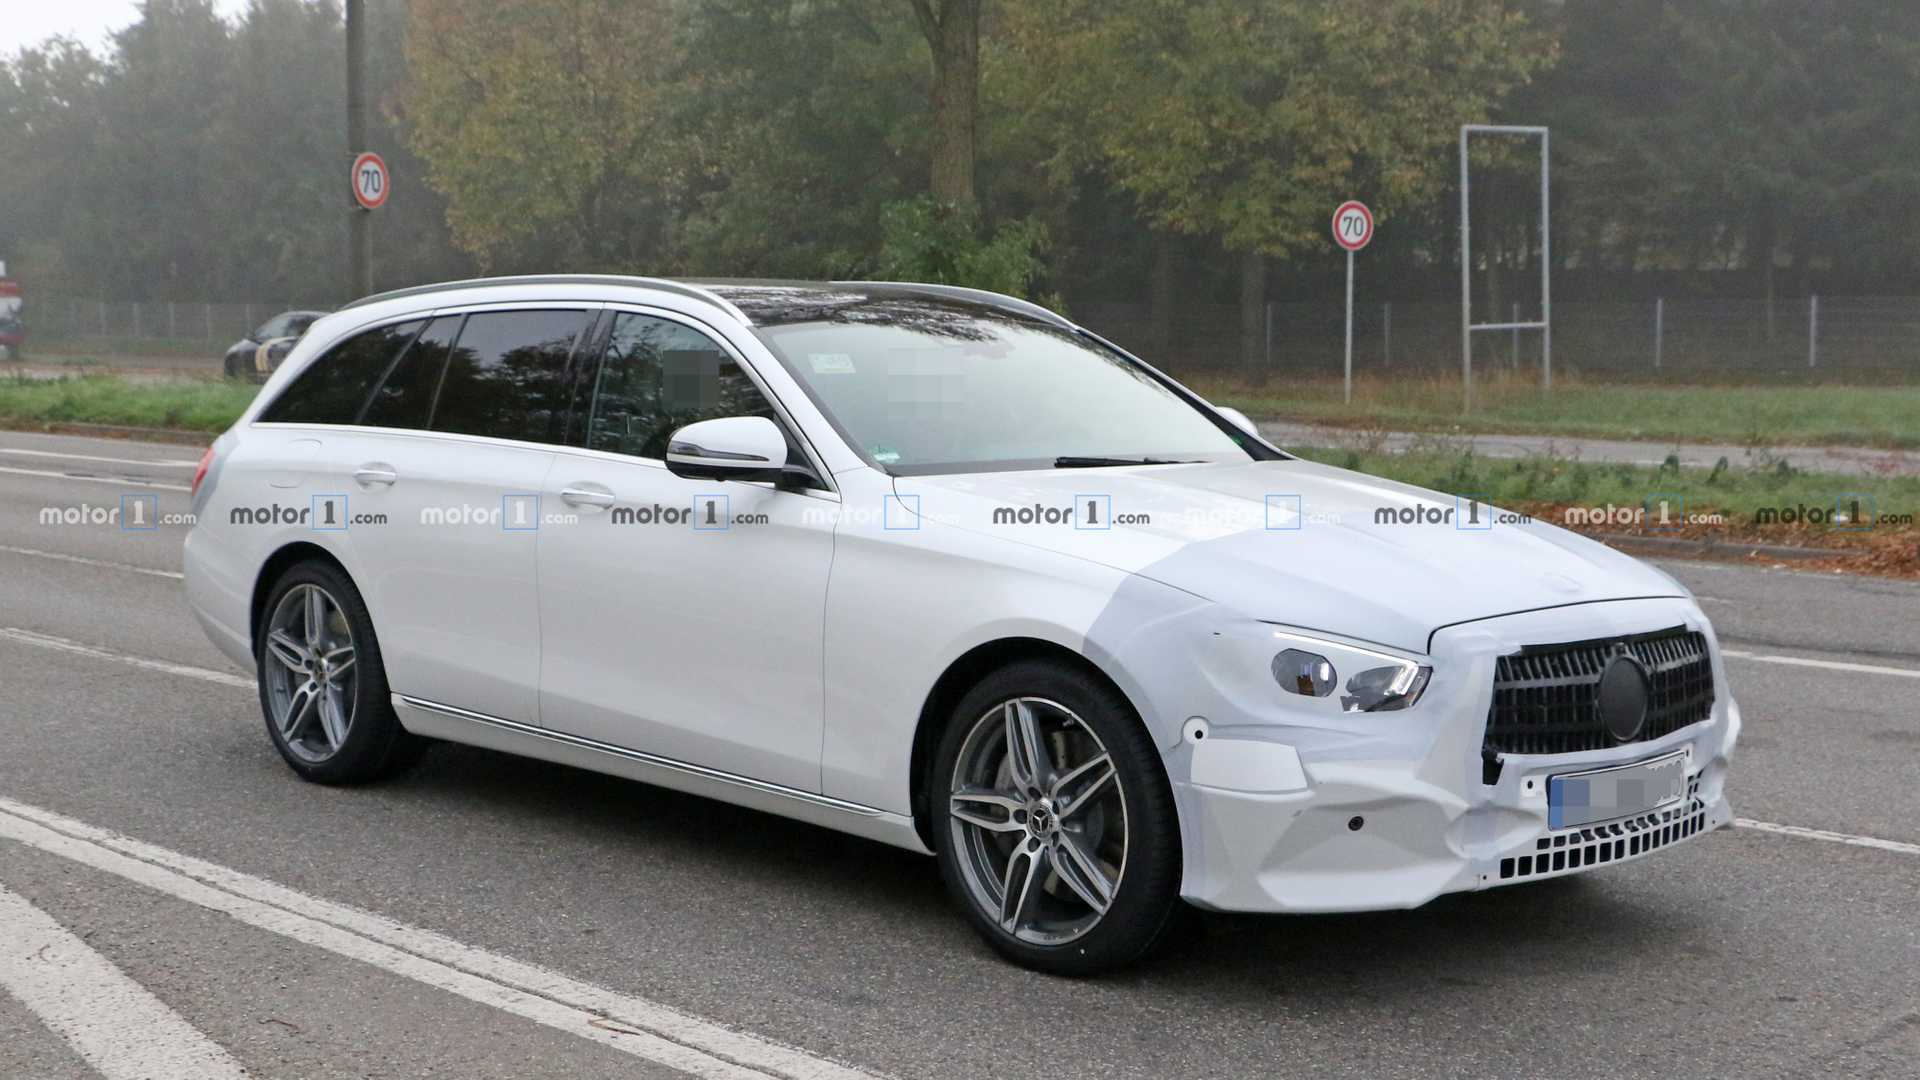 28 All New 2020 Mercedes E Class Images for 2020 Mercedes E Class